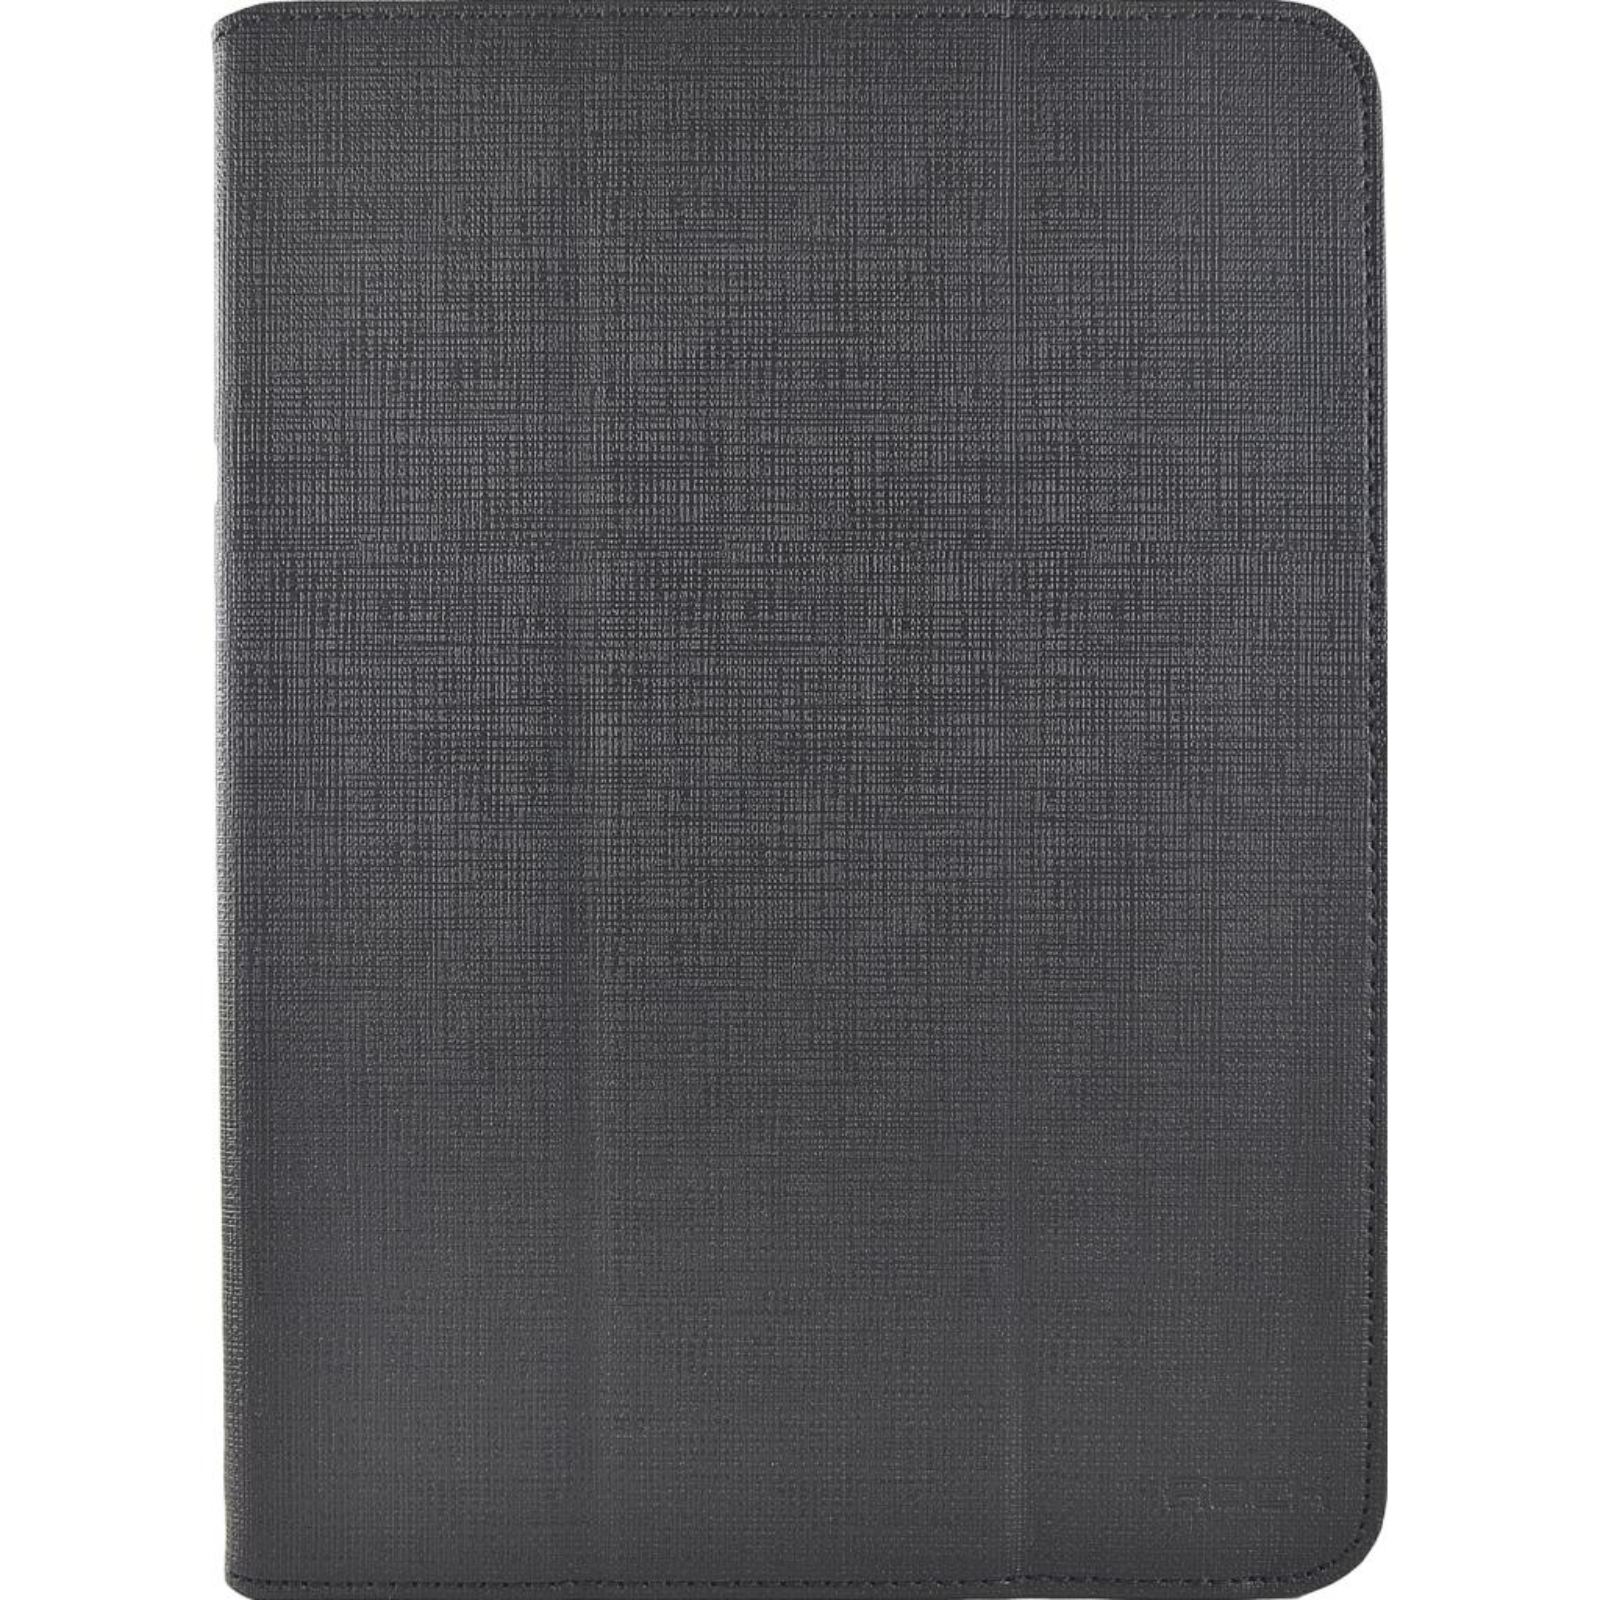 "Чехол для планшета Rock Samsung Galaxy Tab3 10,1"" flexible series black (P5200-40186)"